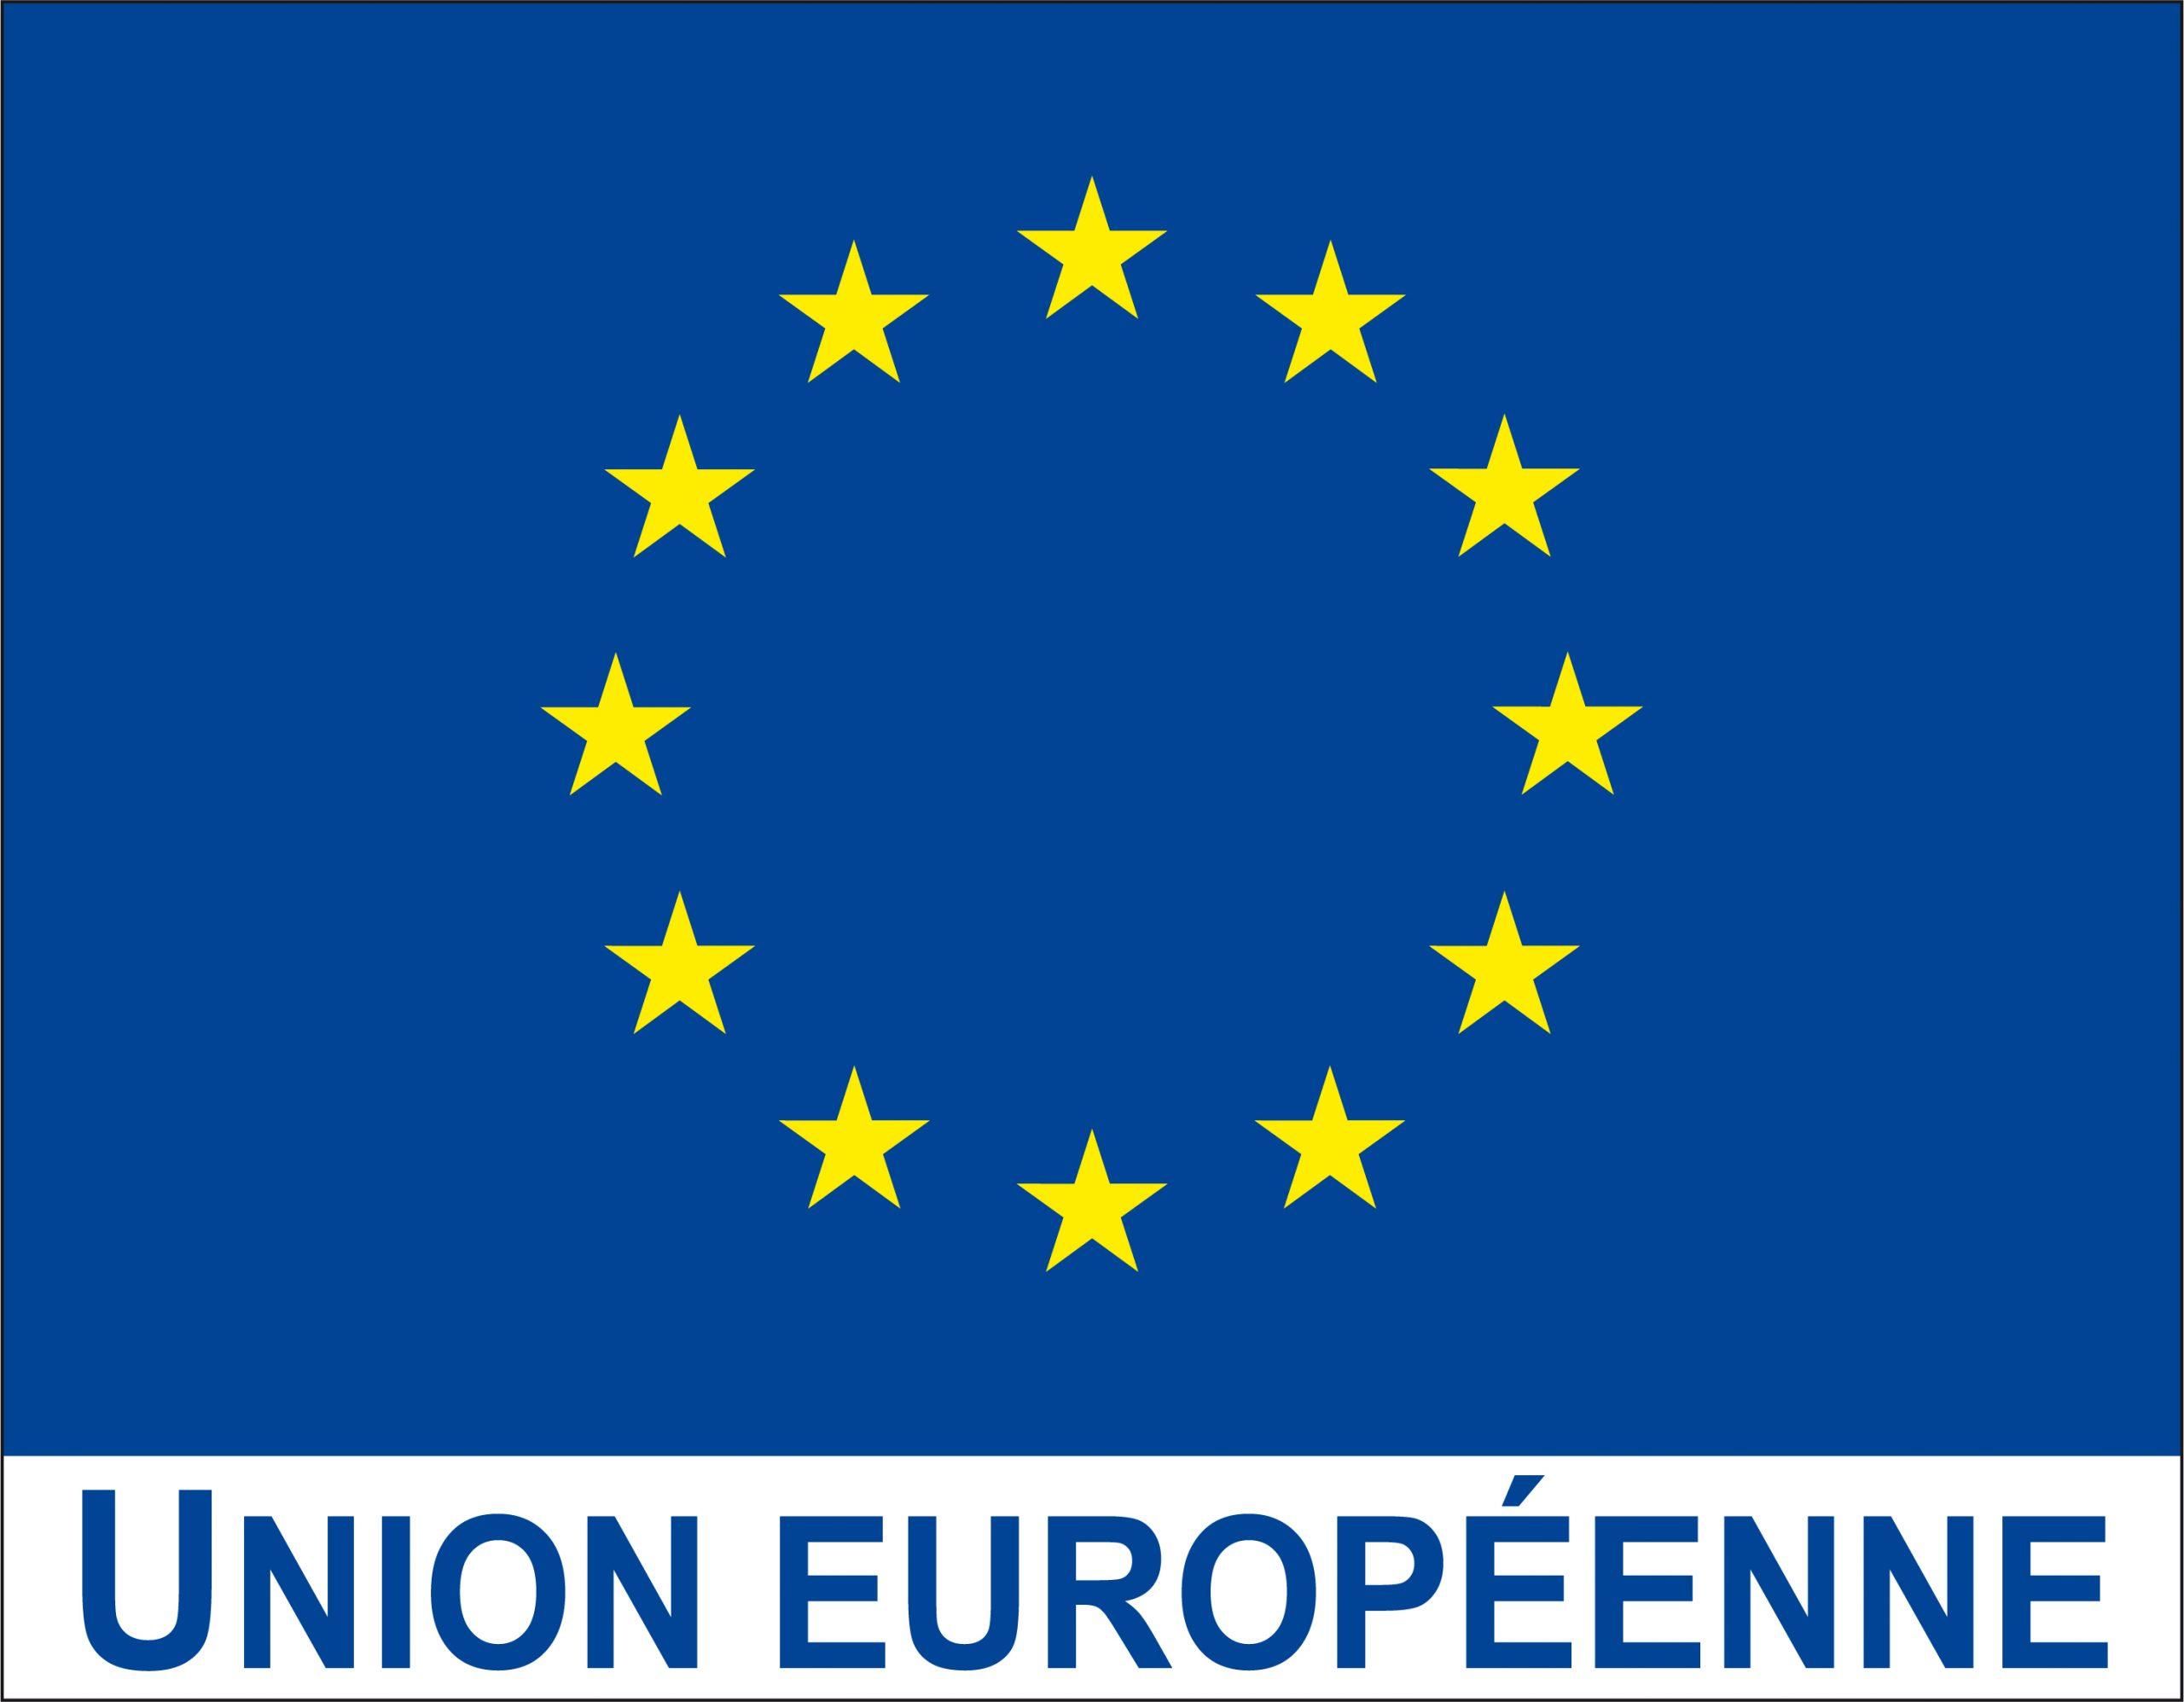 Union-Européenne-scaled-1